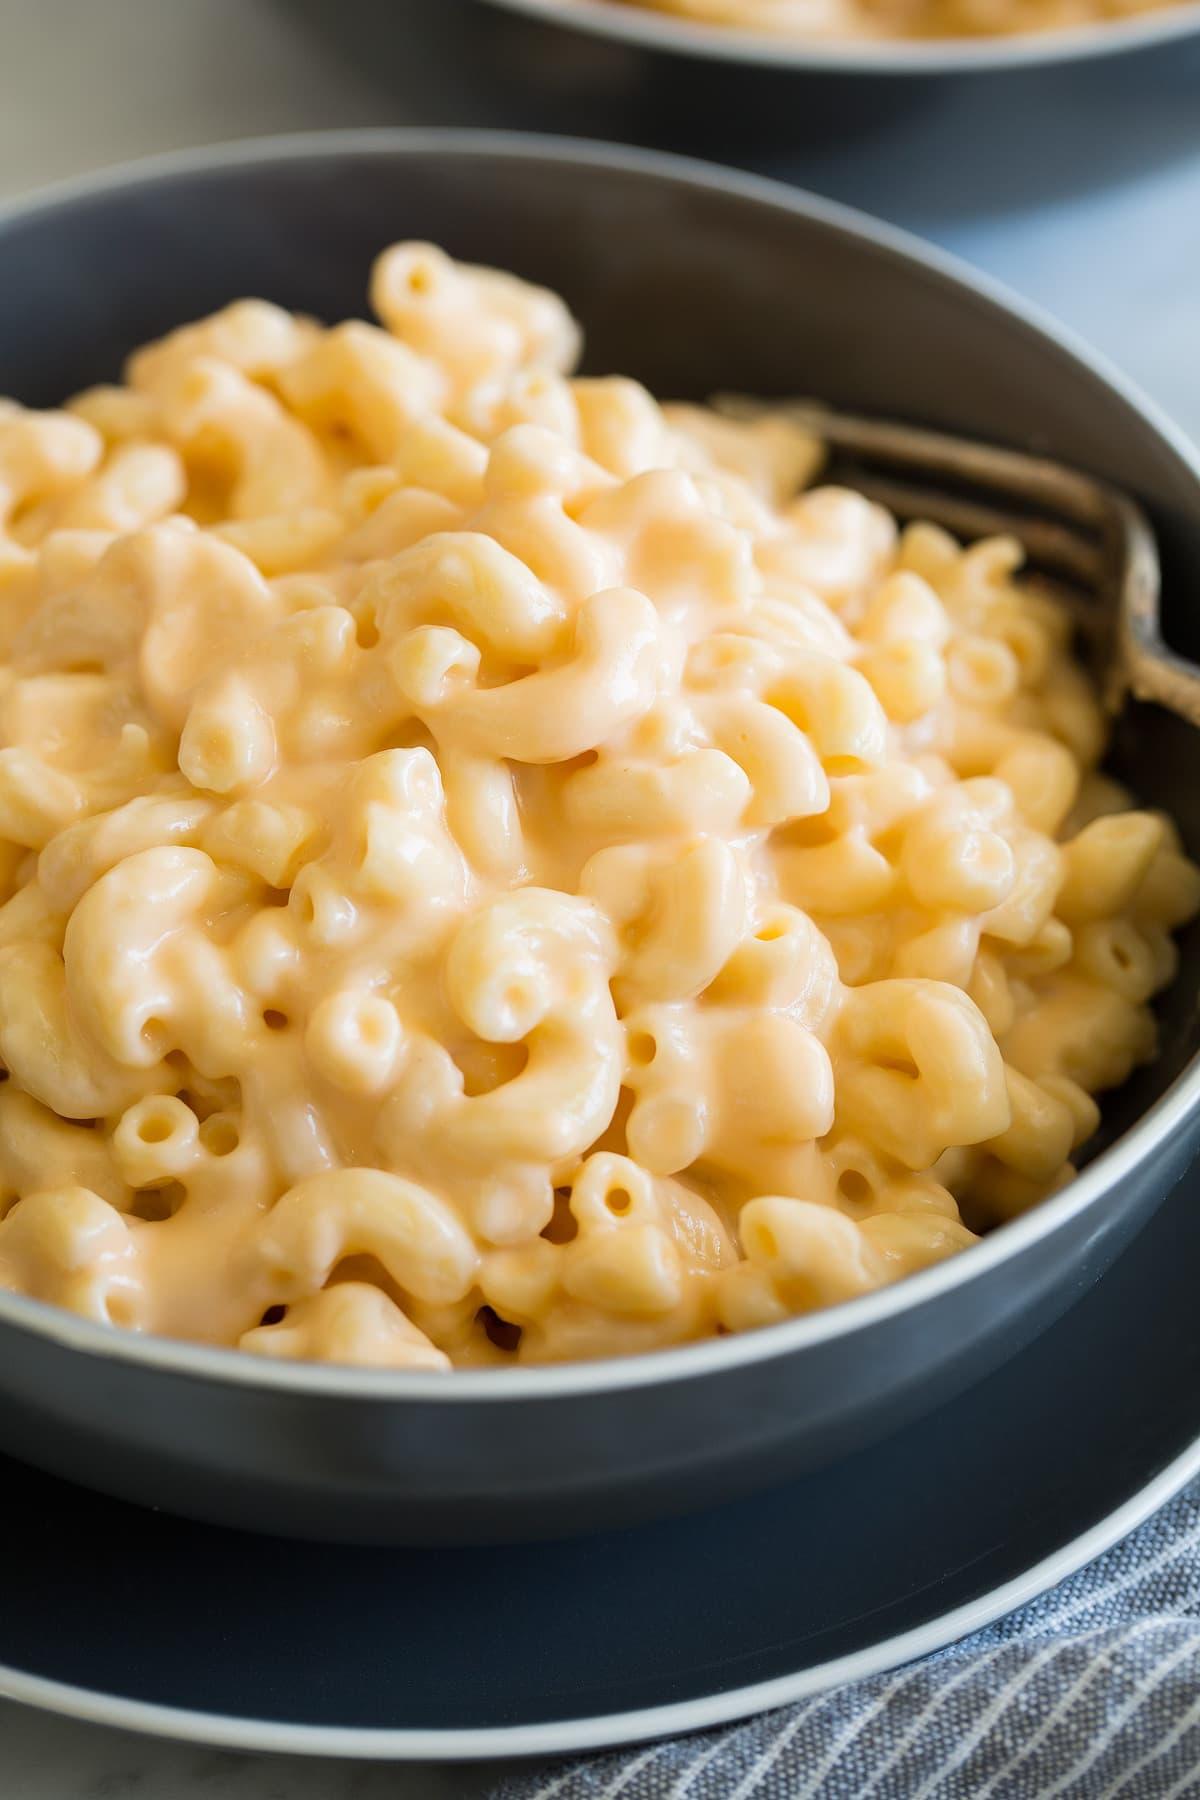 The Best 3 Winter Comfort Food Recipes Education University Of Groningen